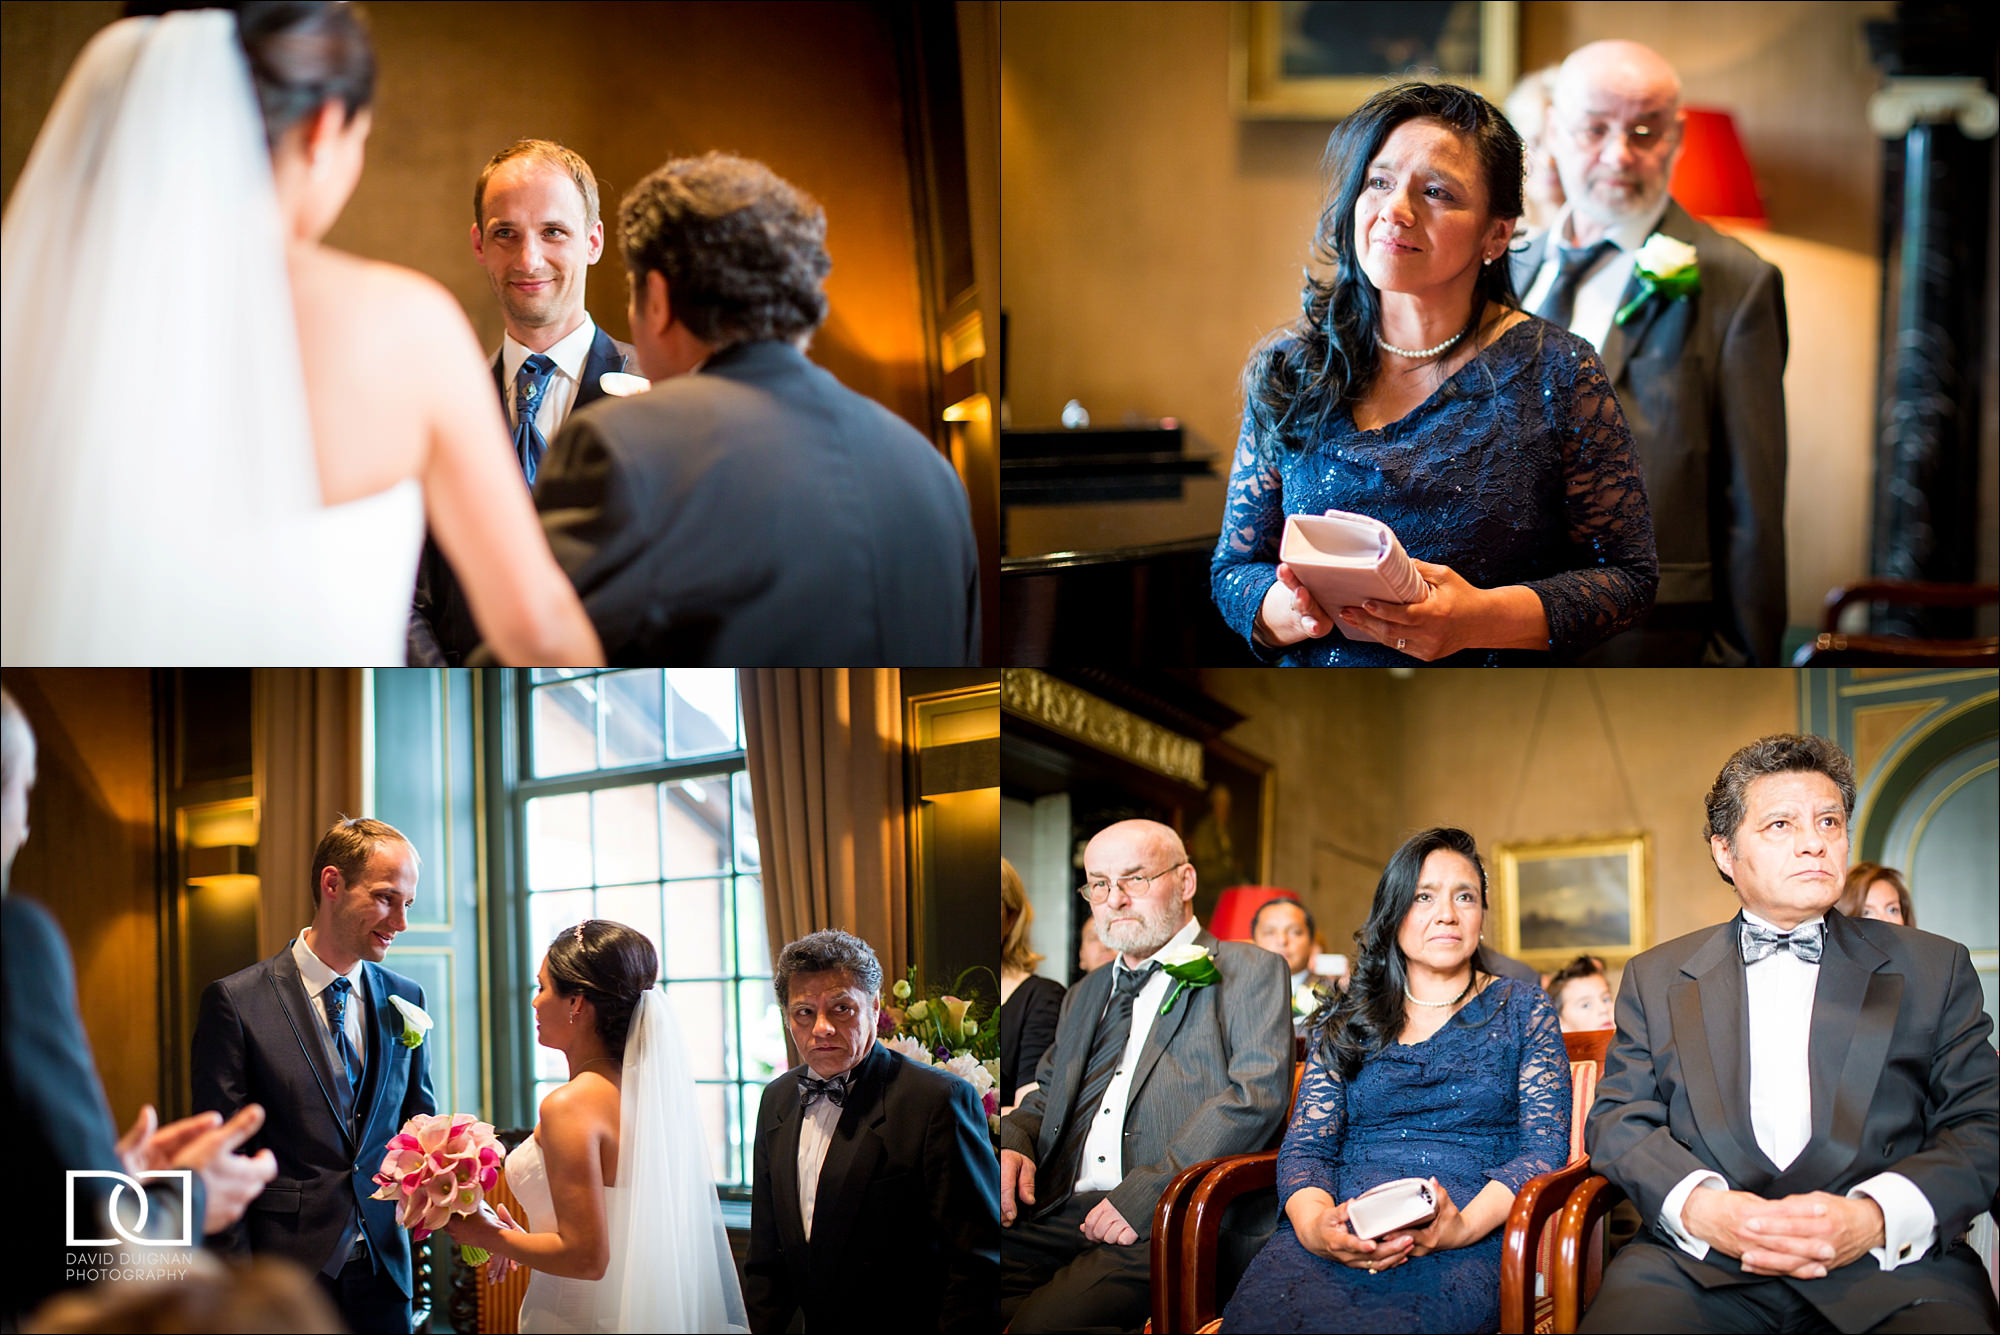 dublin wedding photographer david duignan photography wedding photos 0022